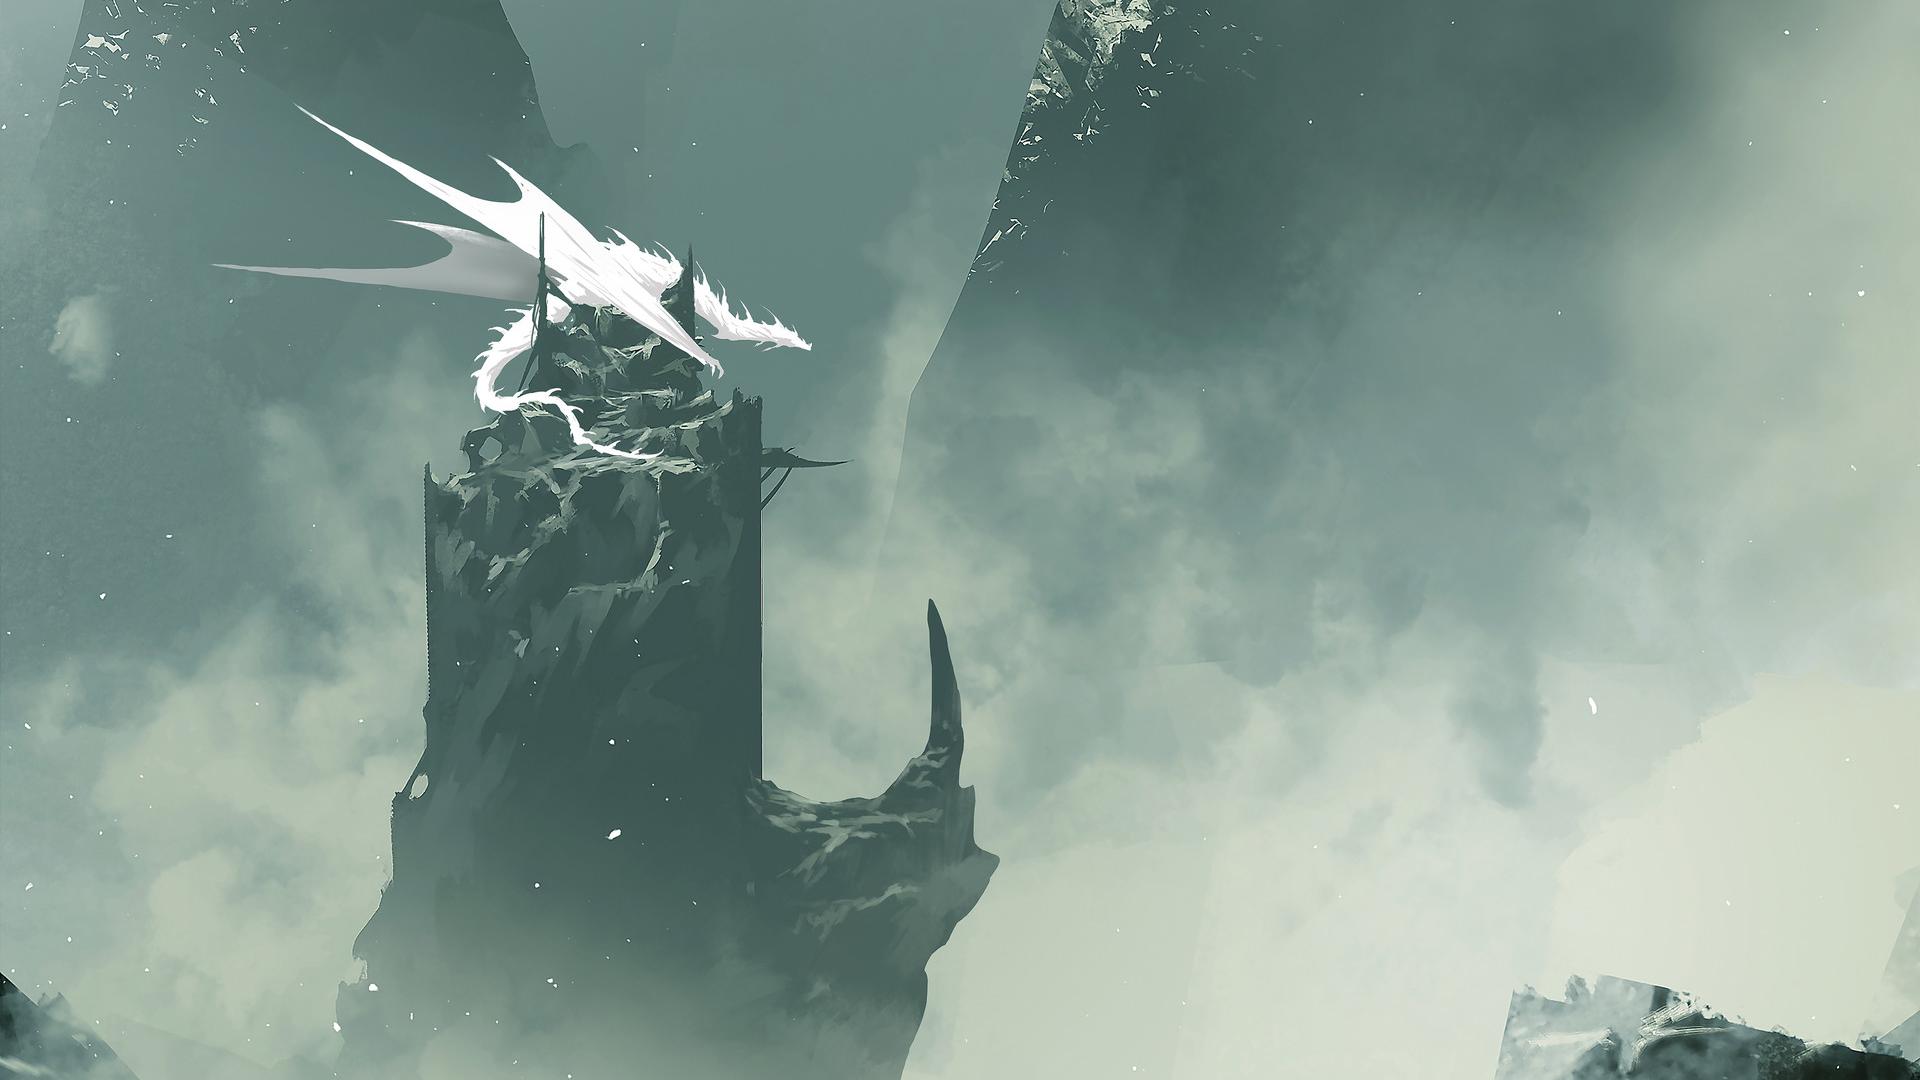 General 1920x1080 fantasy art dragon white mist minimalism